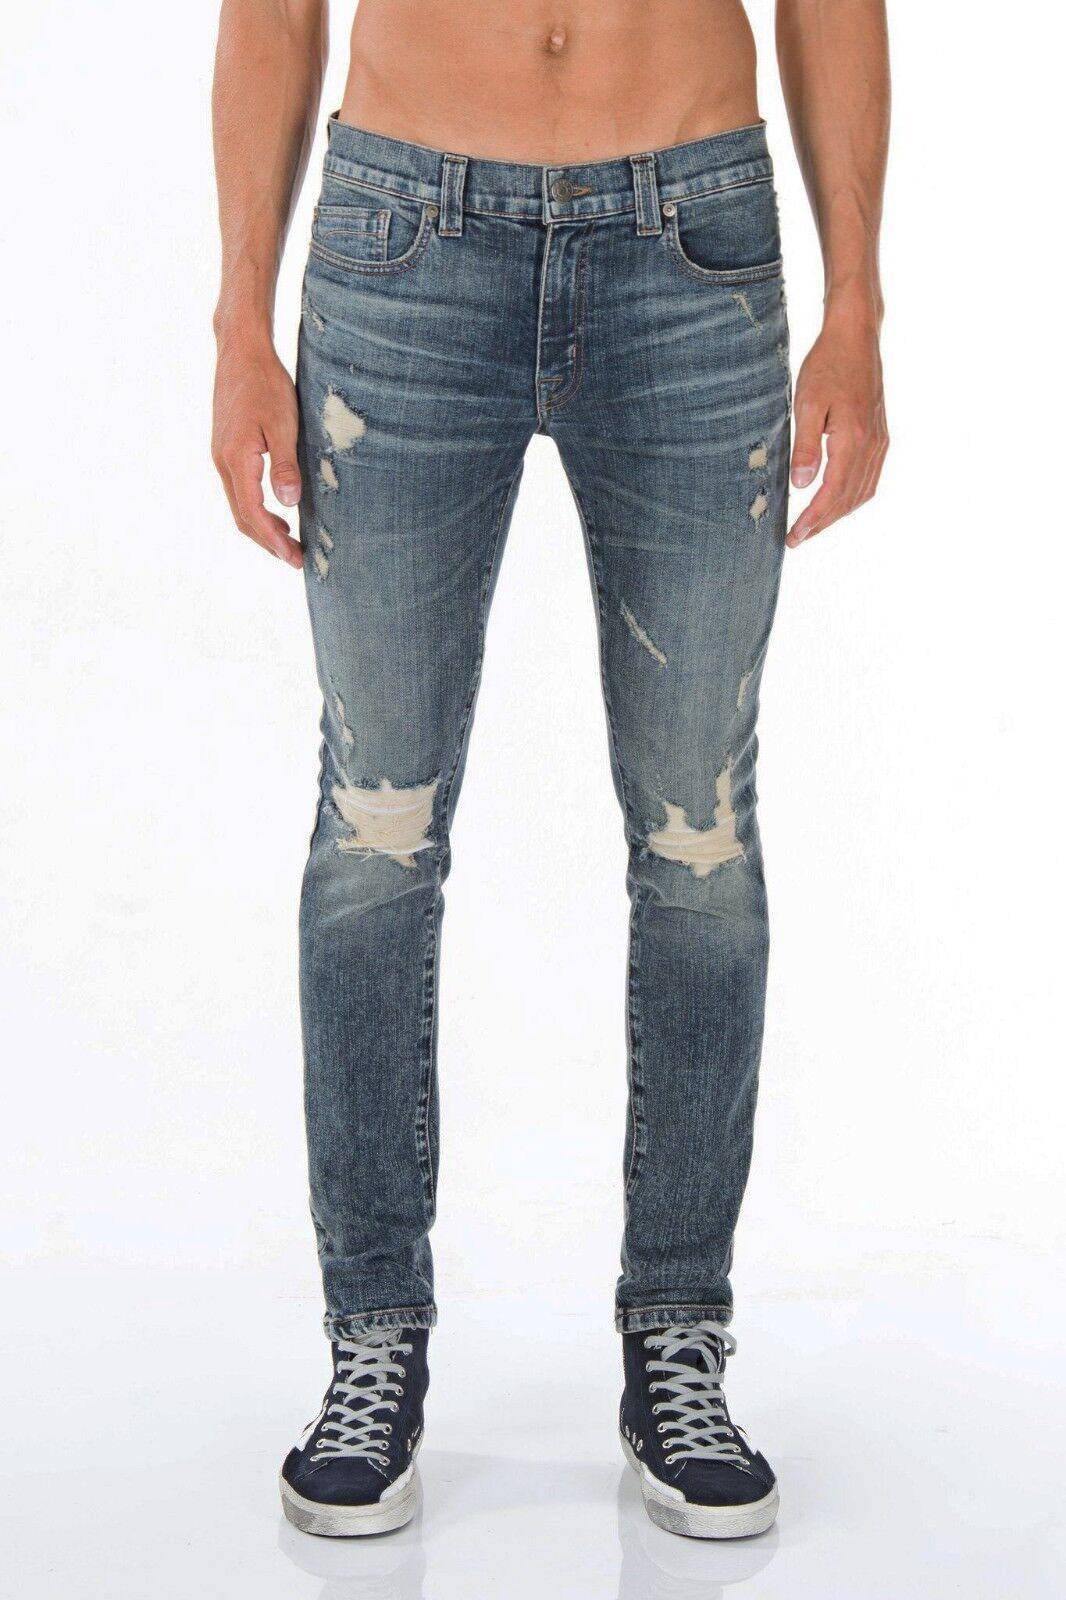 Authentic FIDELITY DENIM Men's Distressed Slim Skinny Diesel Jeans Denim